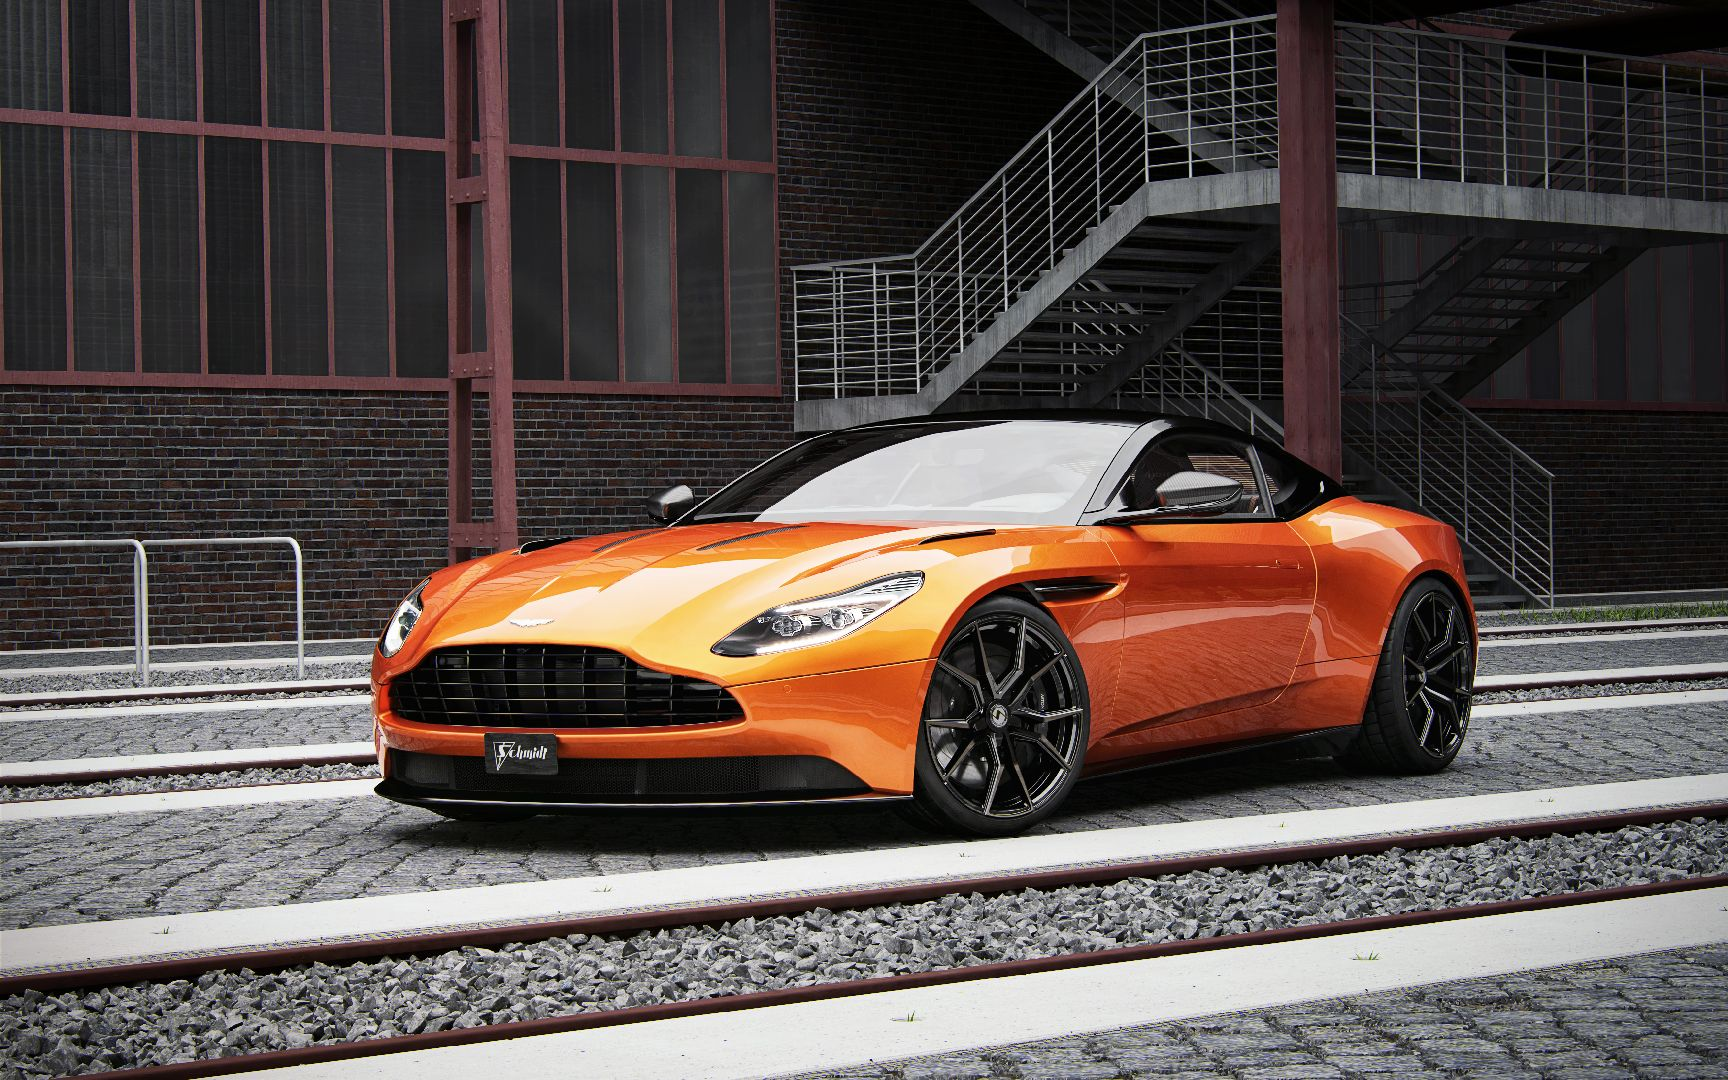 Am Db Schmidt Winterfelgen Front on Aston Martin V8 Vantage